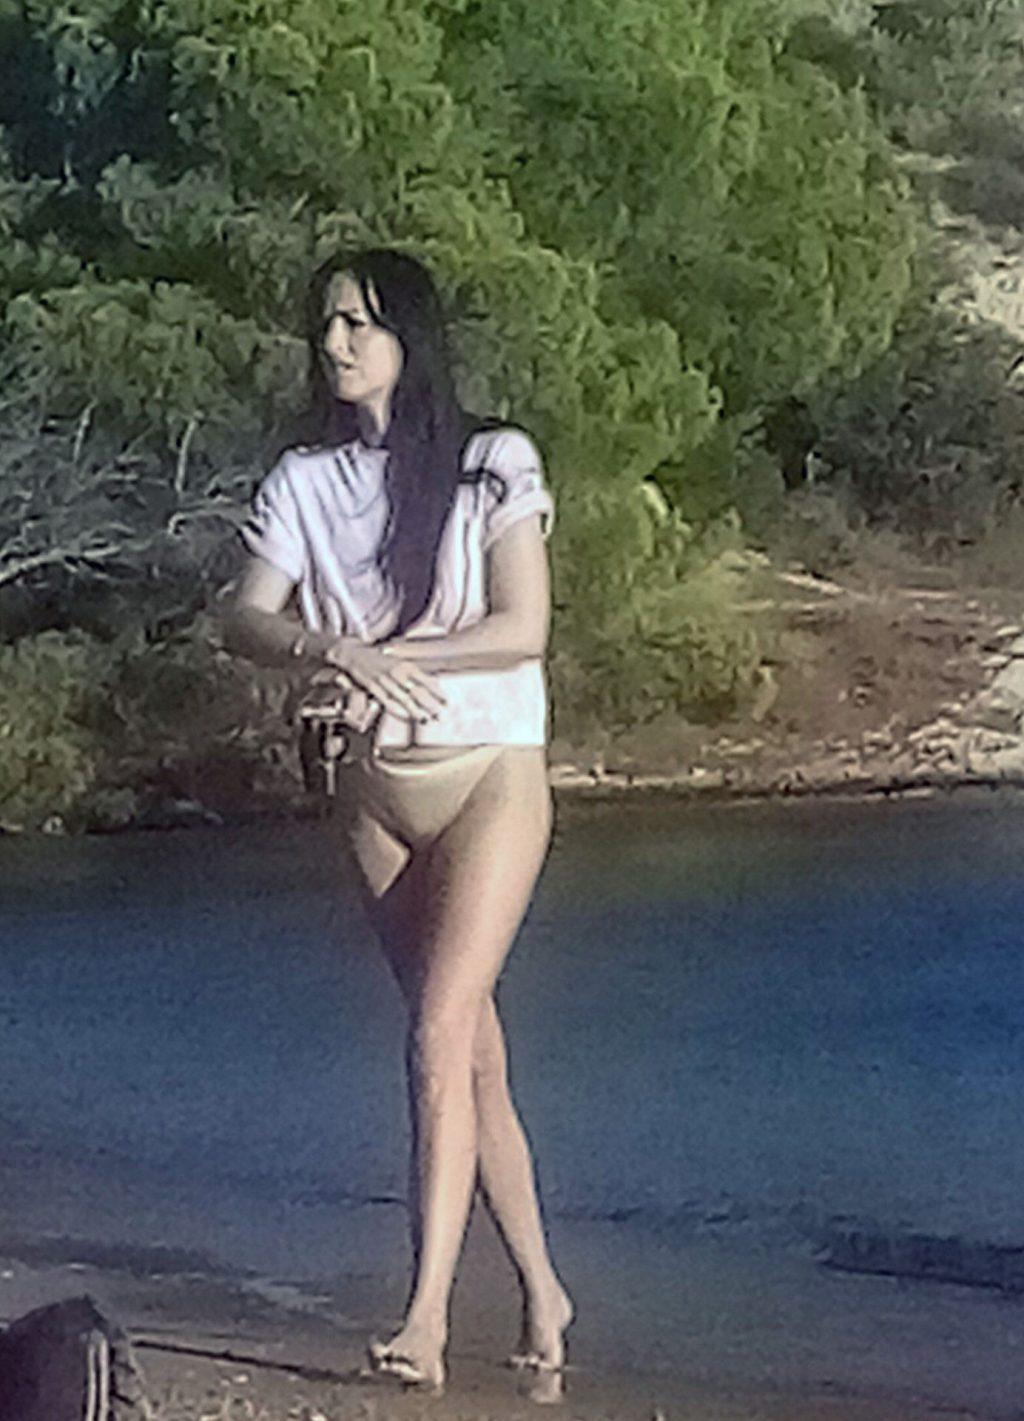 Dakota Johnson Shows Her Tiny Ass at the Beach on Spetses Island (4 Photos)